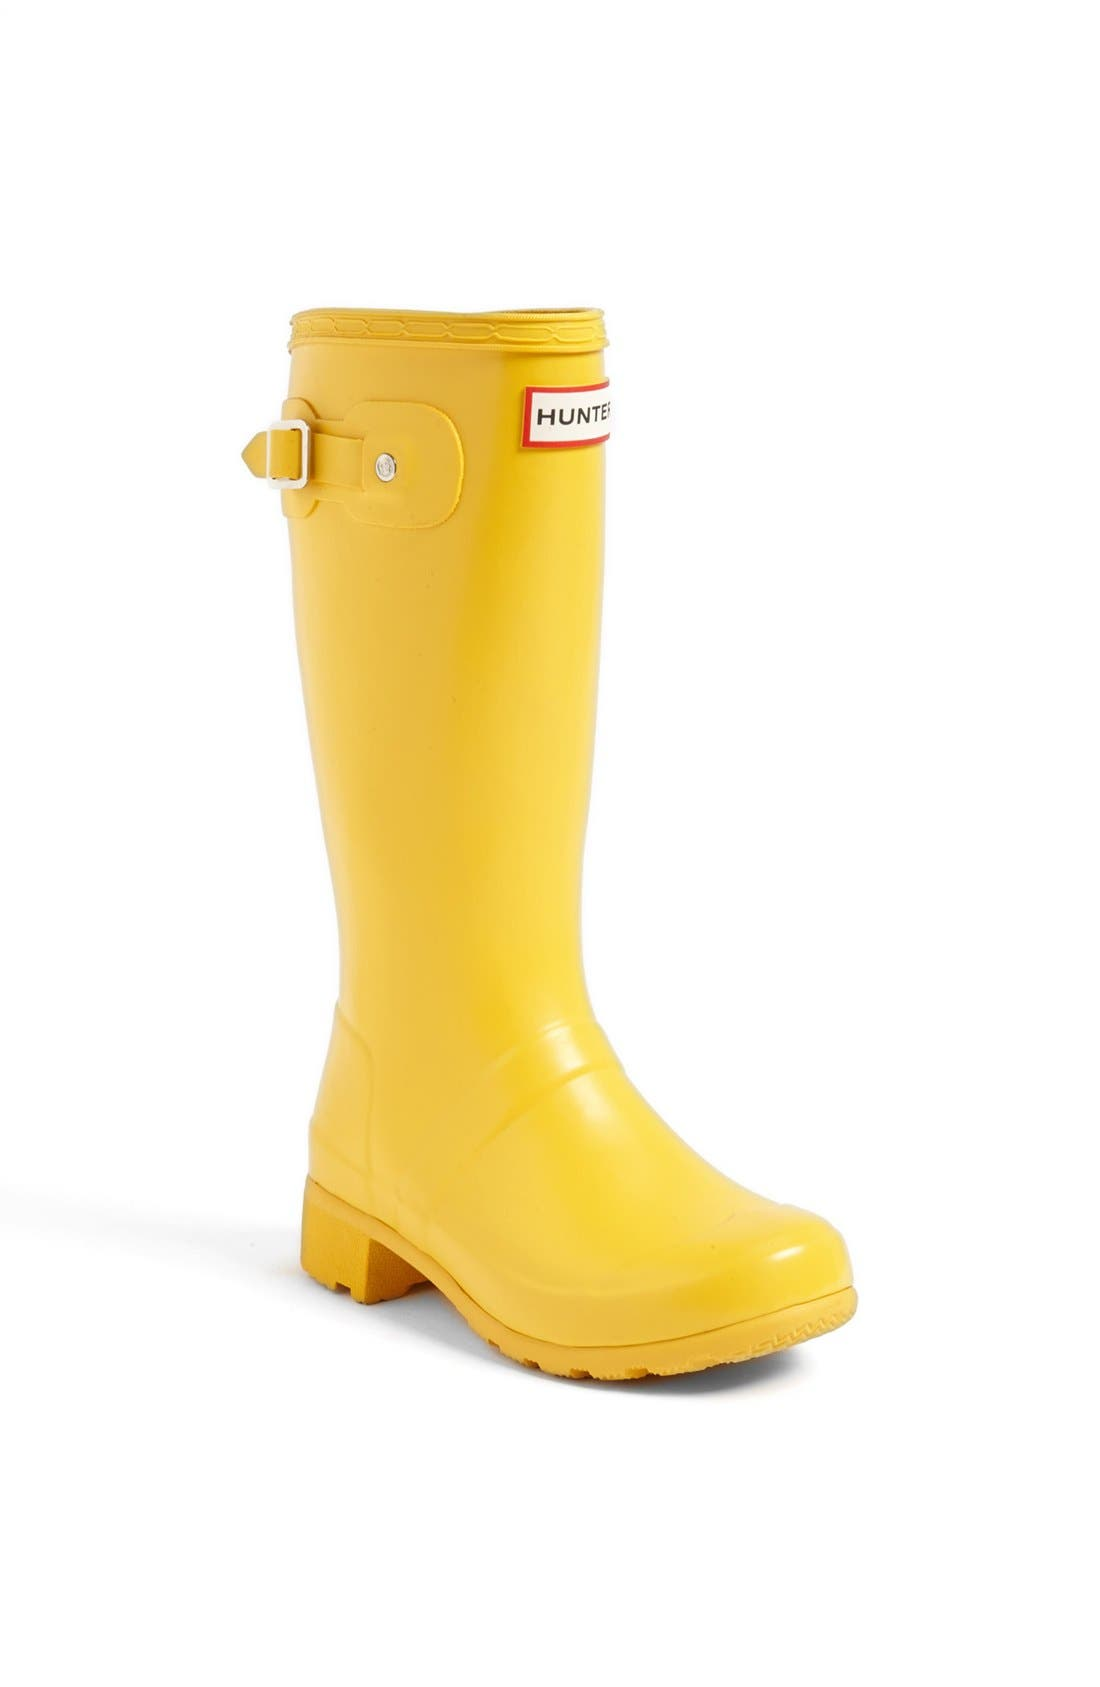 Alternate Image 1 Selected - Hunter 'Tour' Packable Rain Boot (Toddler & Little Kid)